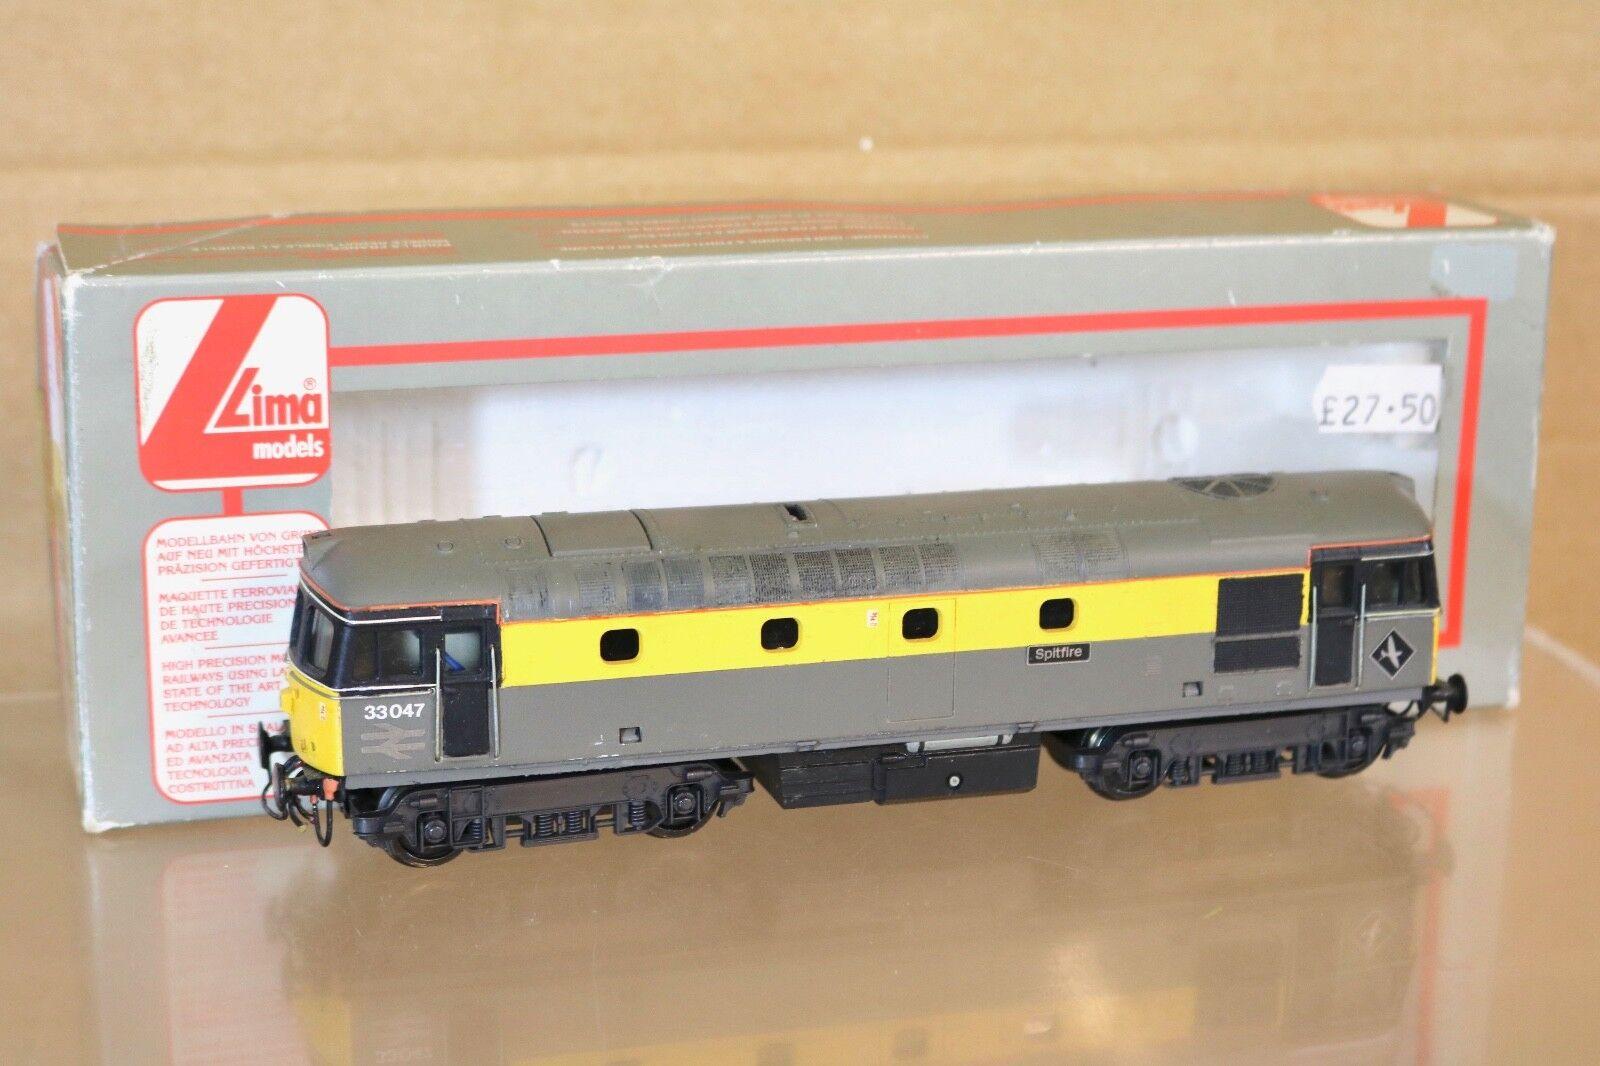 Lima 205070 Rifinite Br Olandese Livrea Classe 33 Locomotiva 33047 Spitfire Np